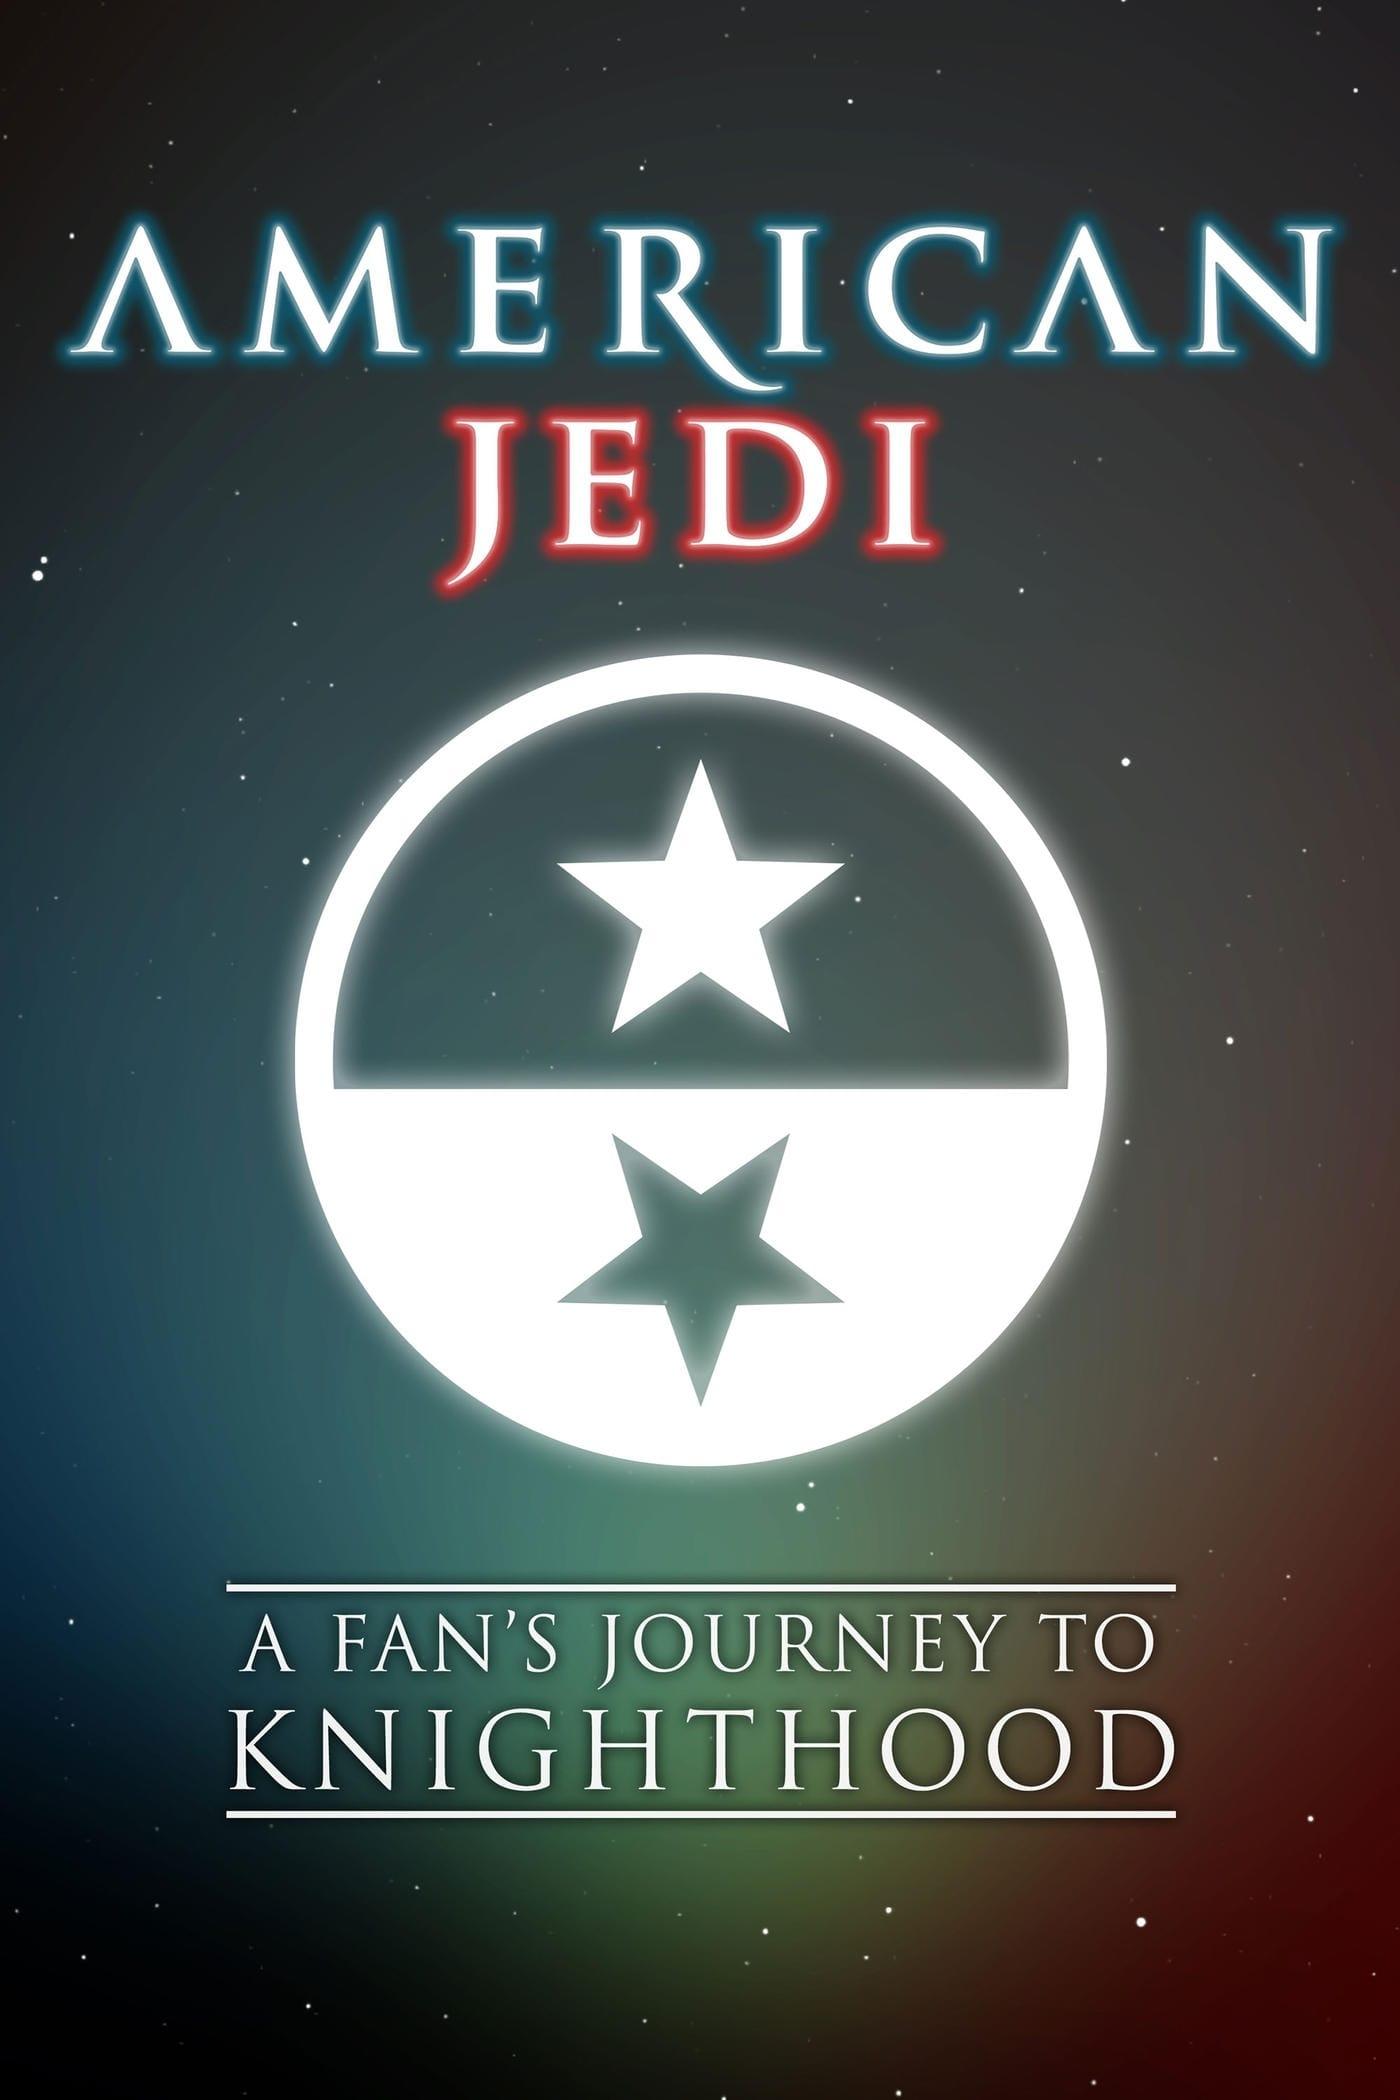 watch American Jedi 2017 online free